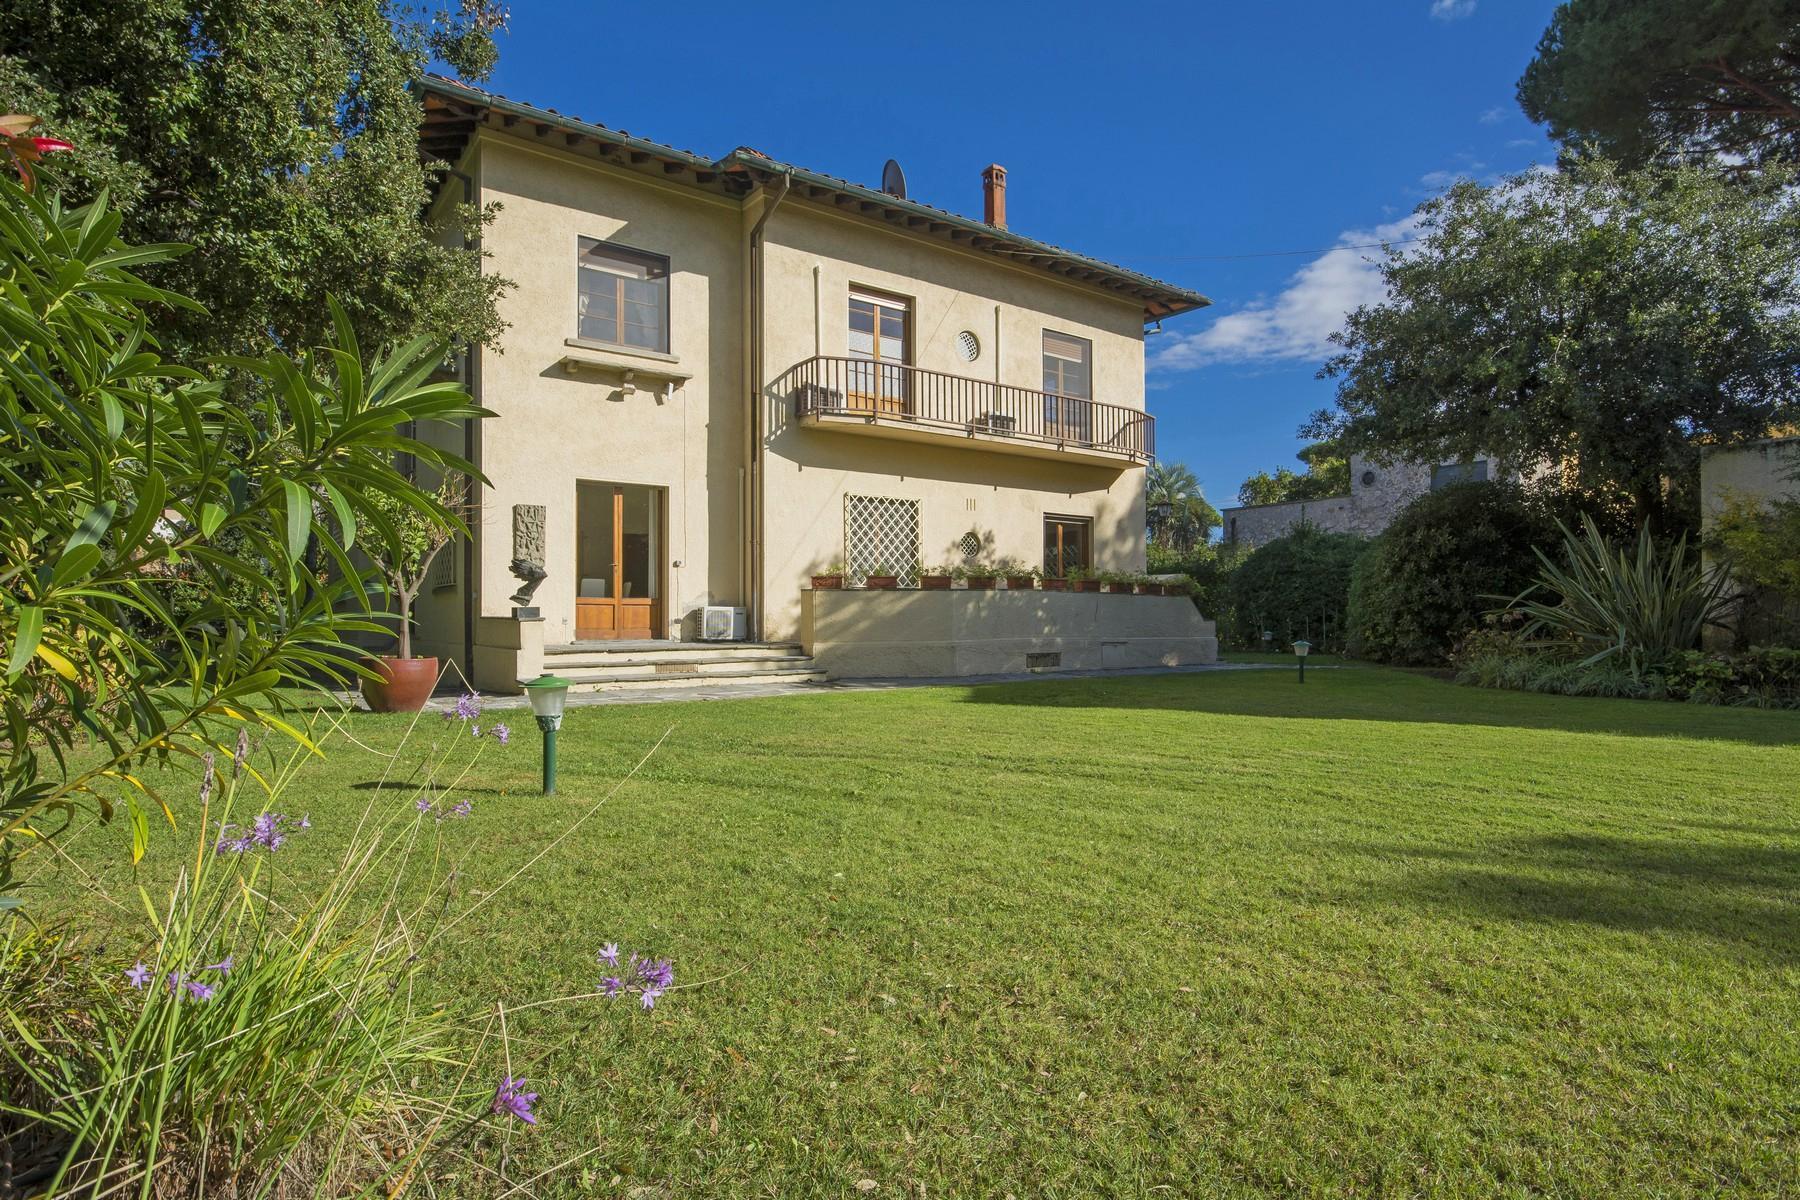 Wonderful villa in Forte dei Marmi - 1